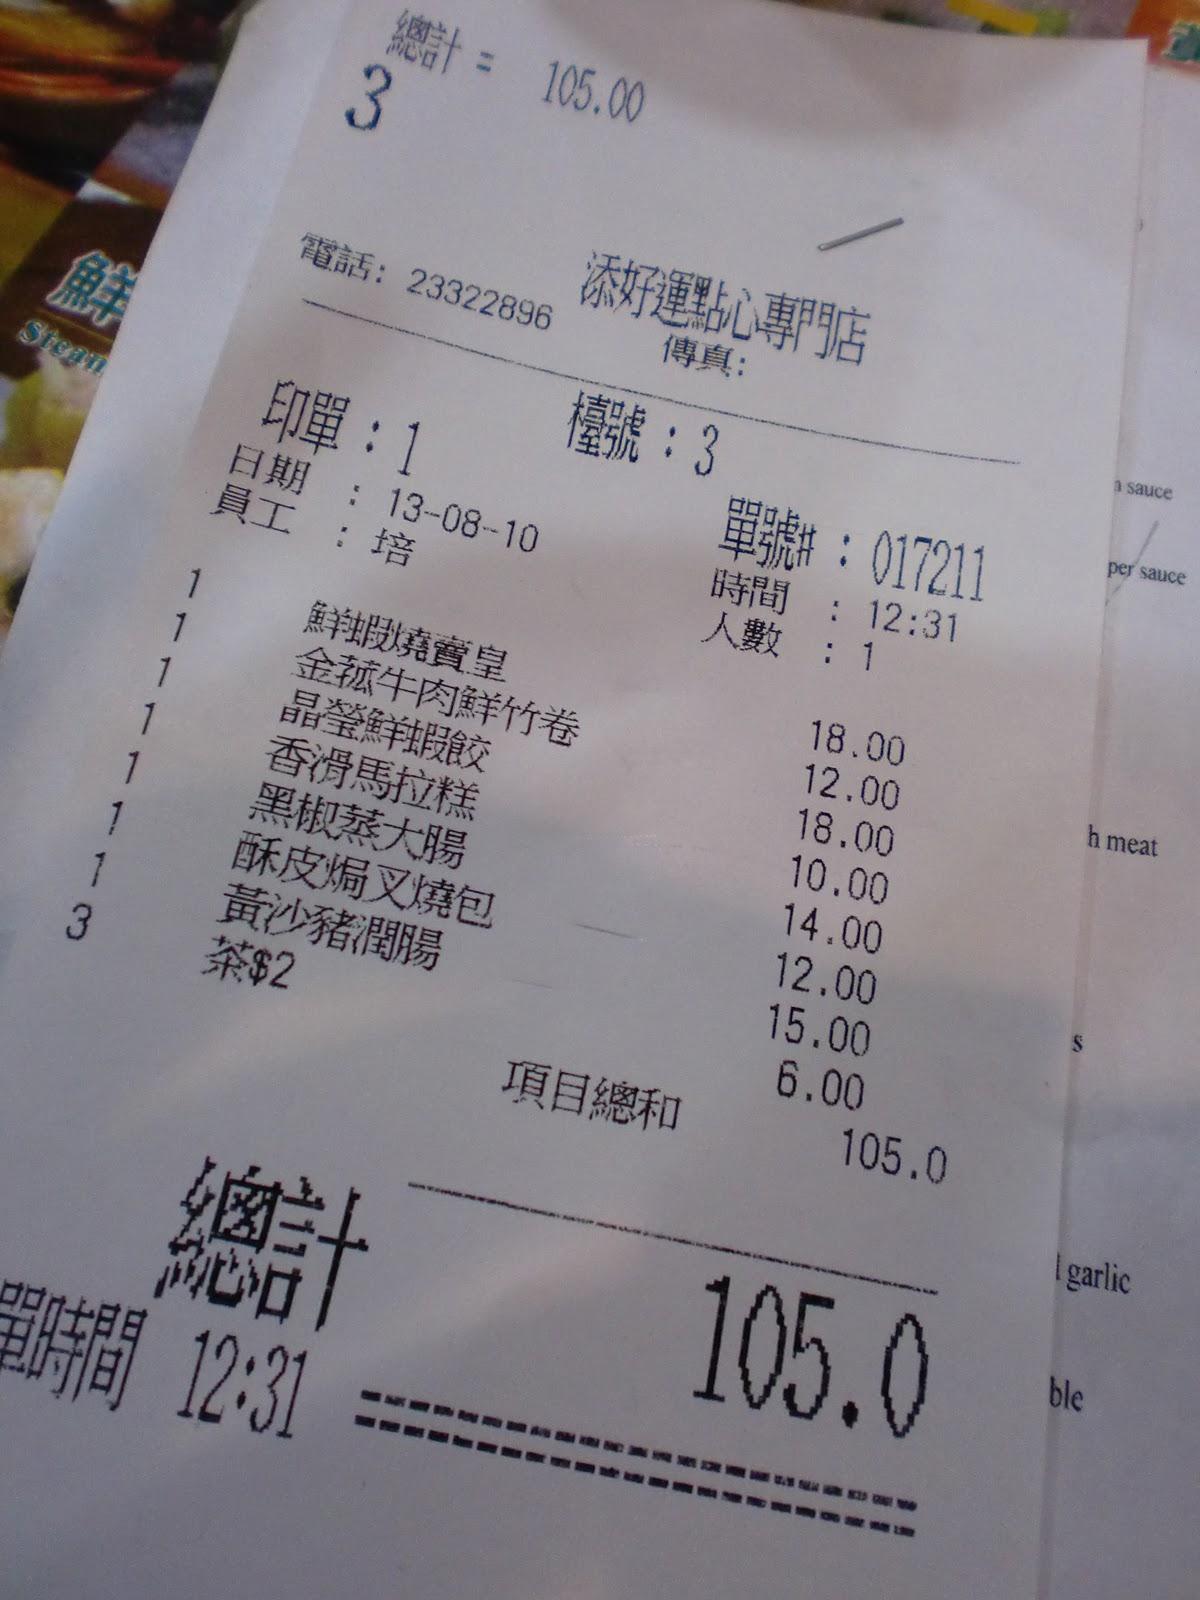 AiZaaaaa's: 米芝蓮一星餐廳 - 添好運點心專門店